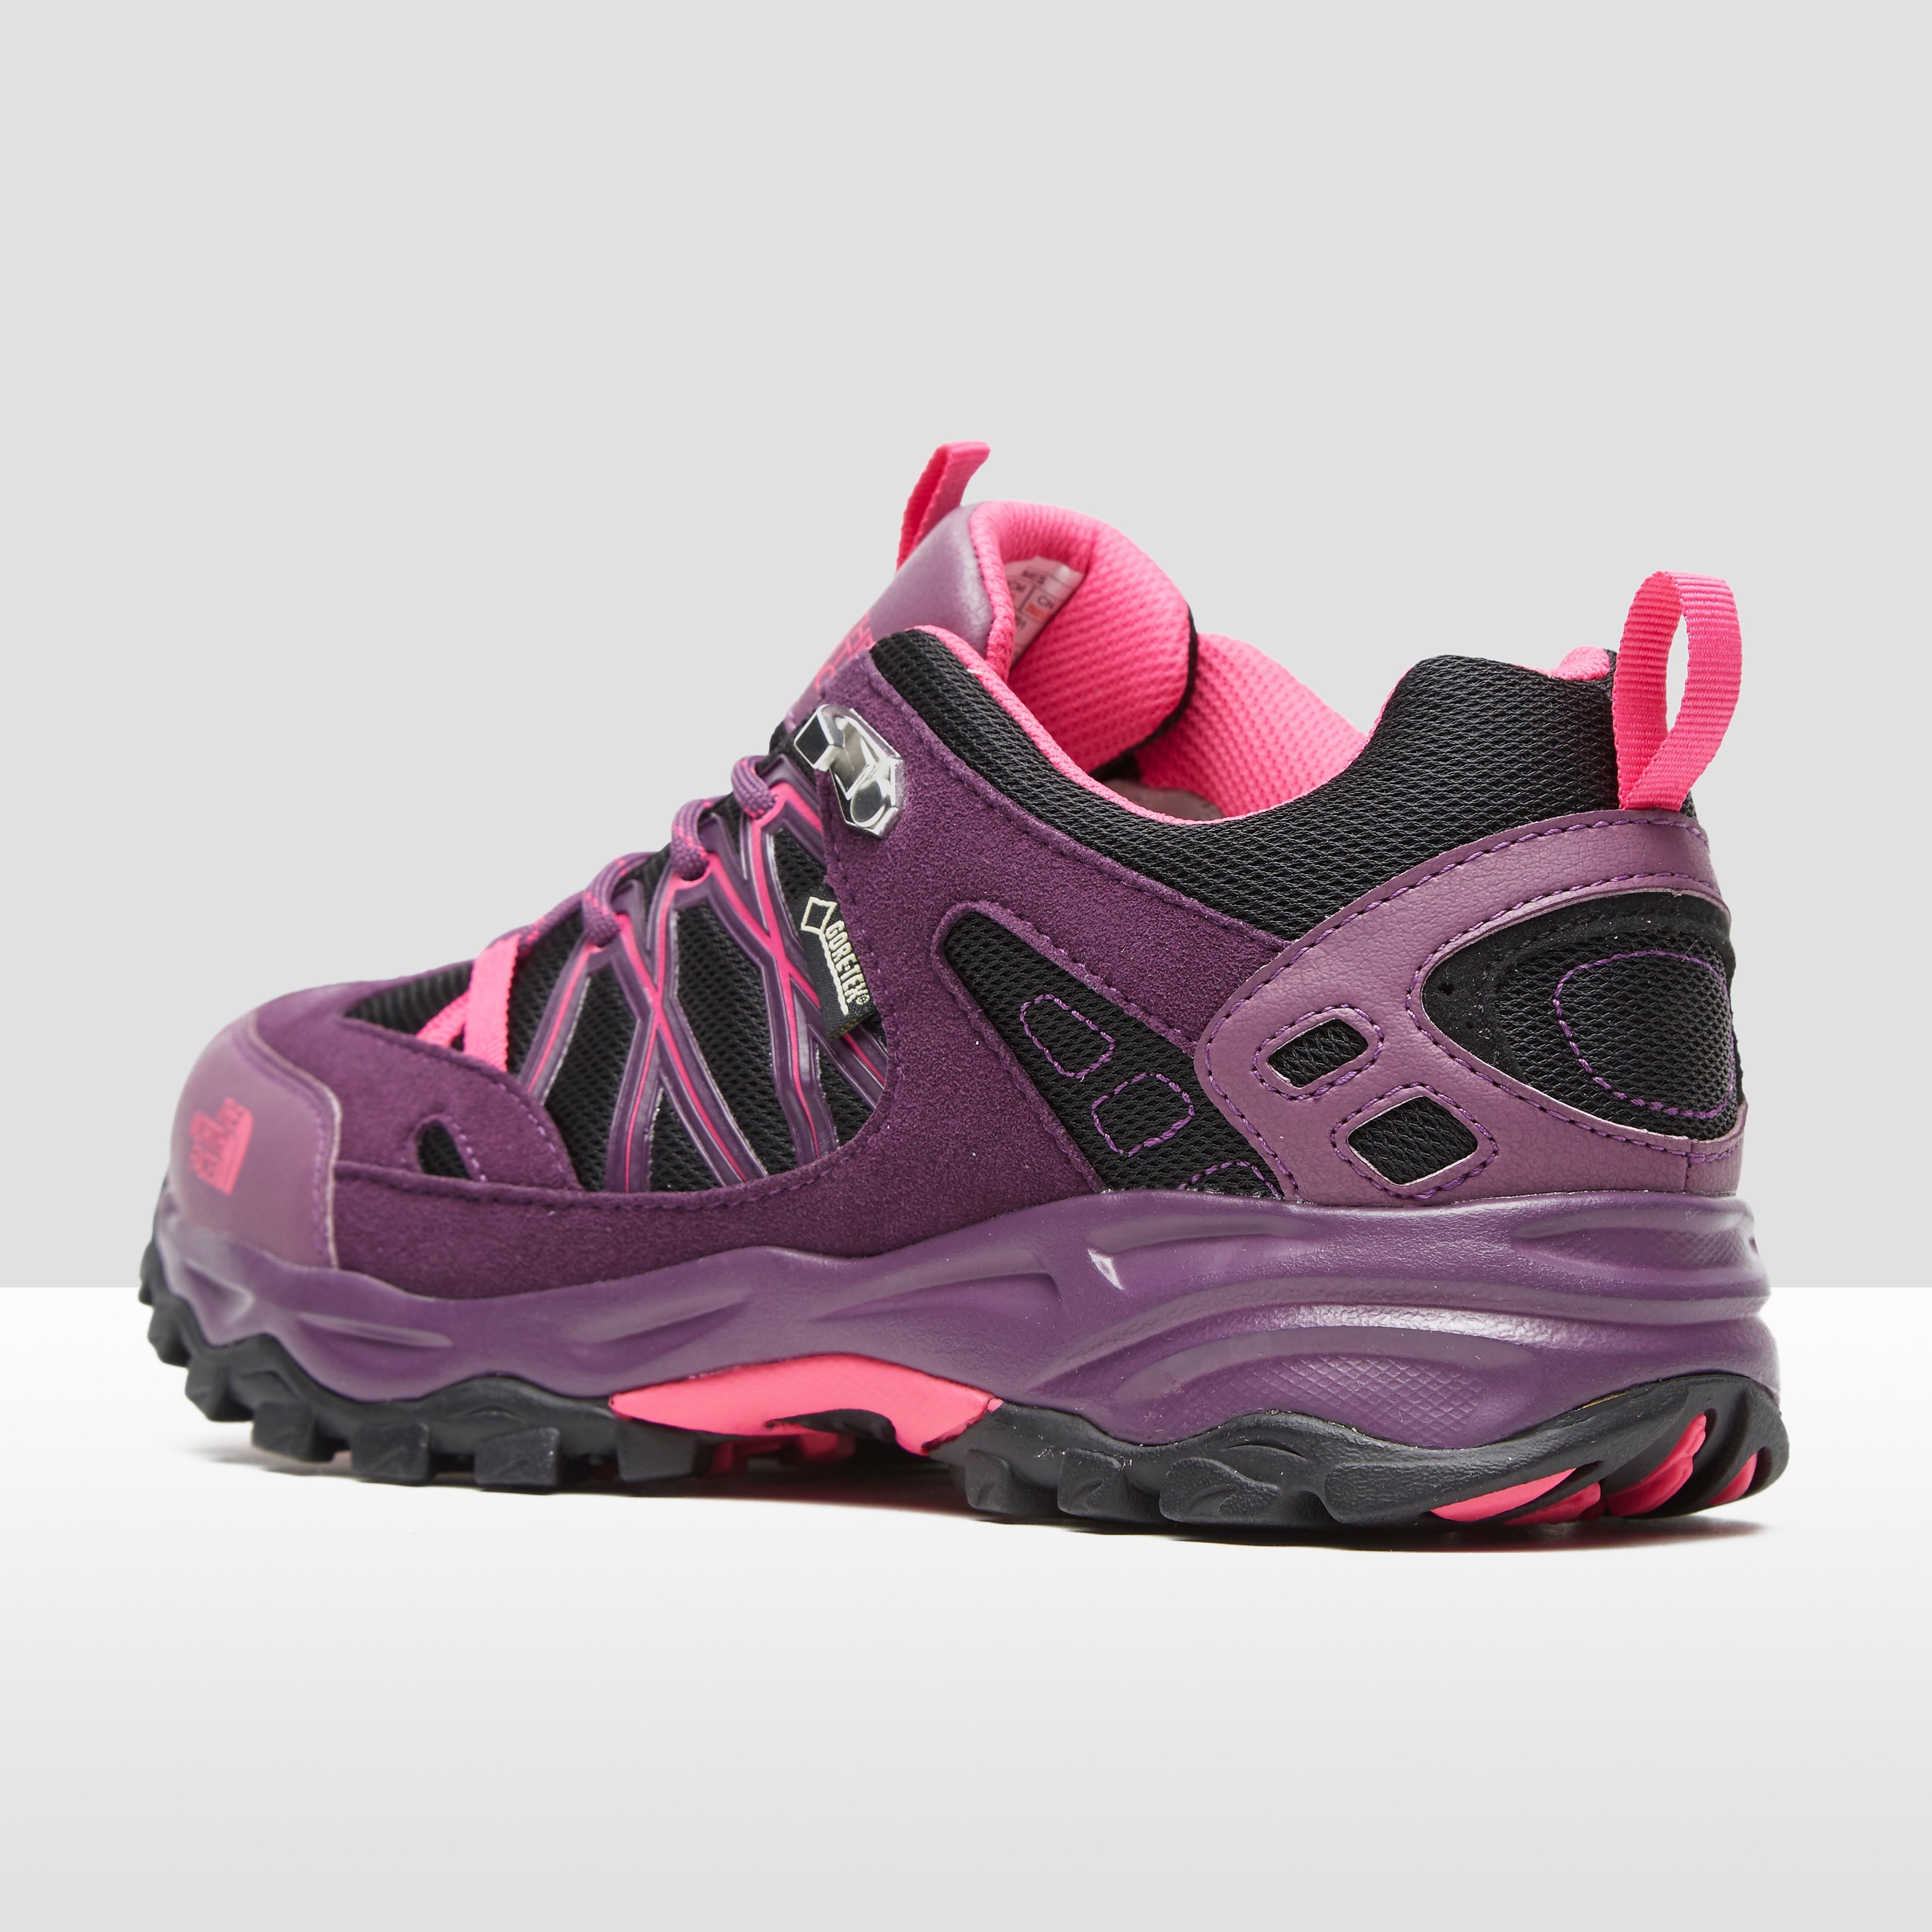 The North Face Terra GTX® Women's Walking Shoes